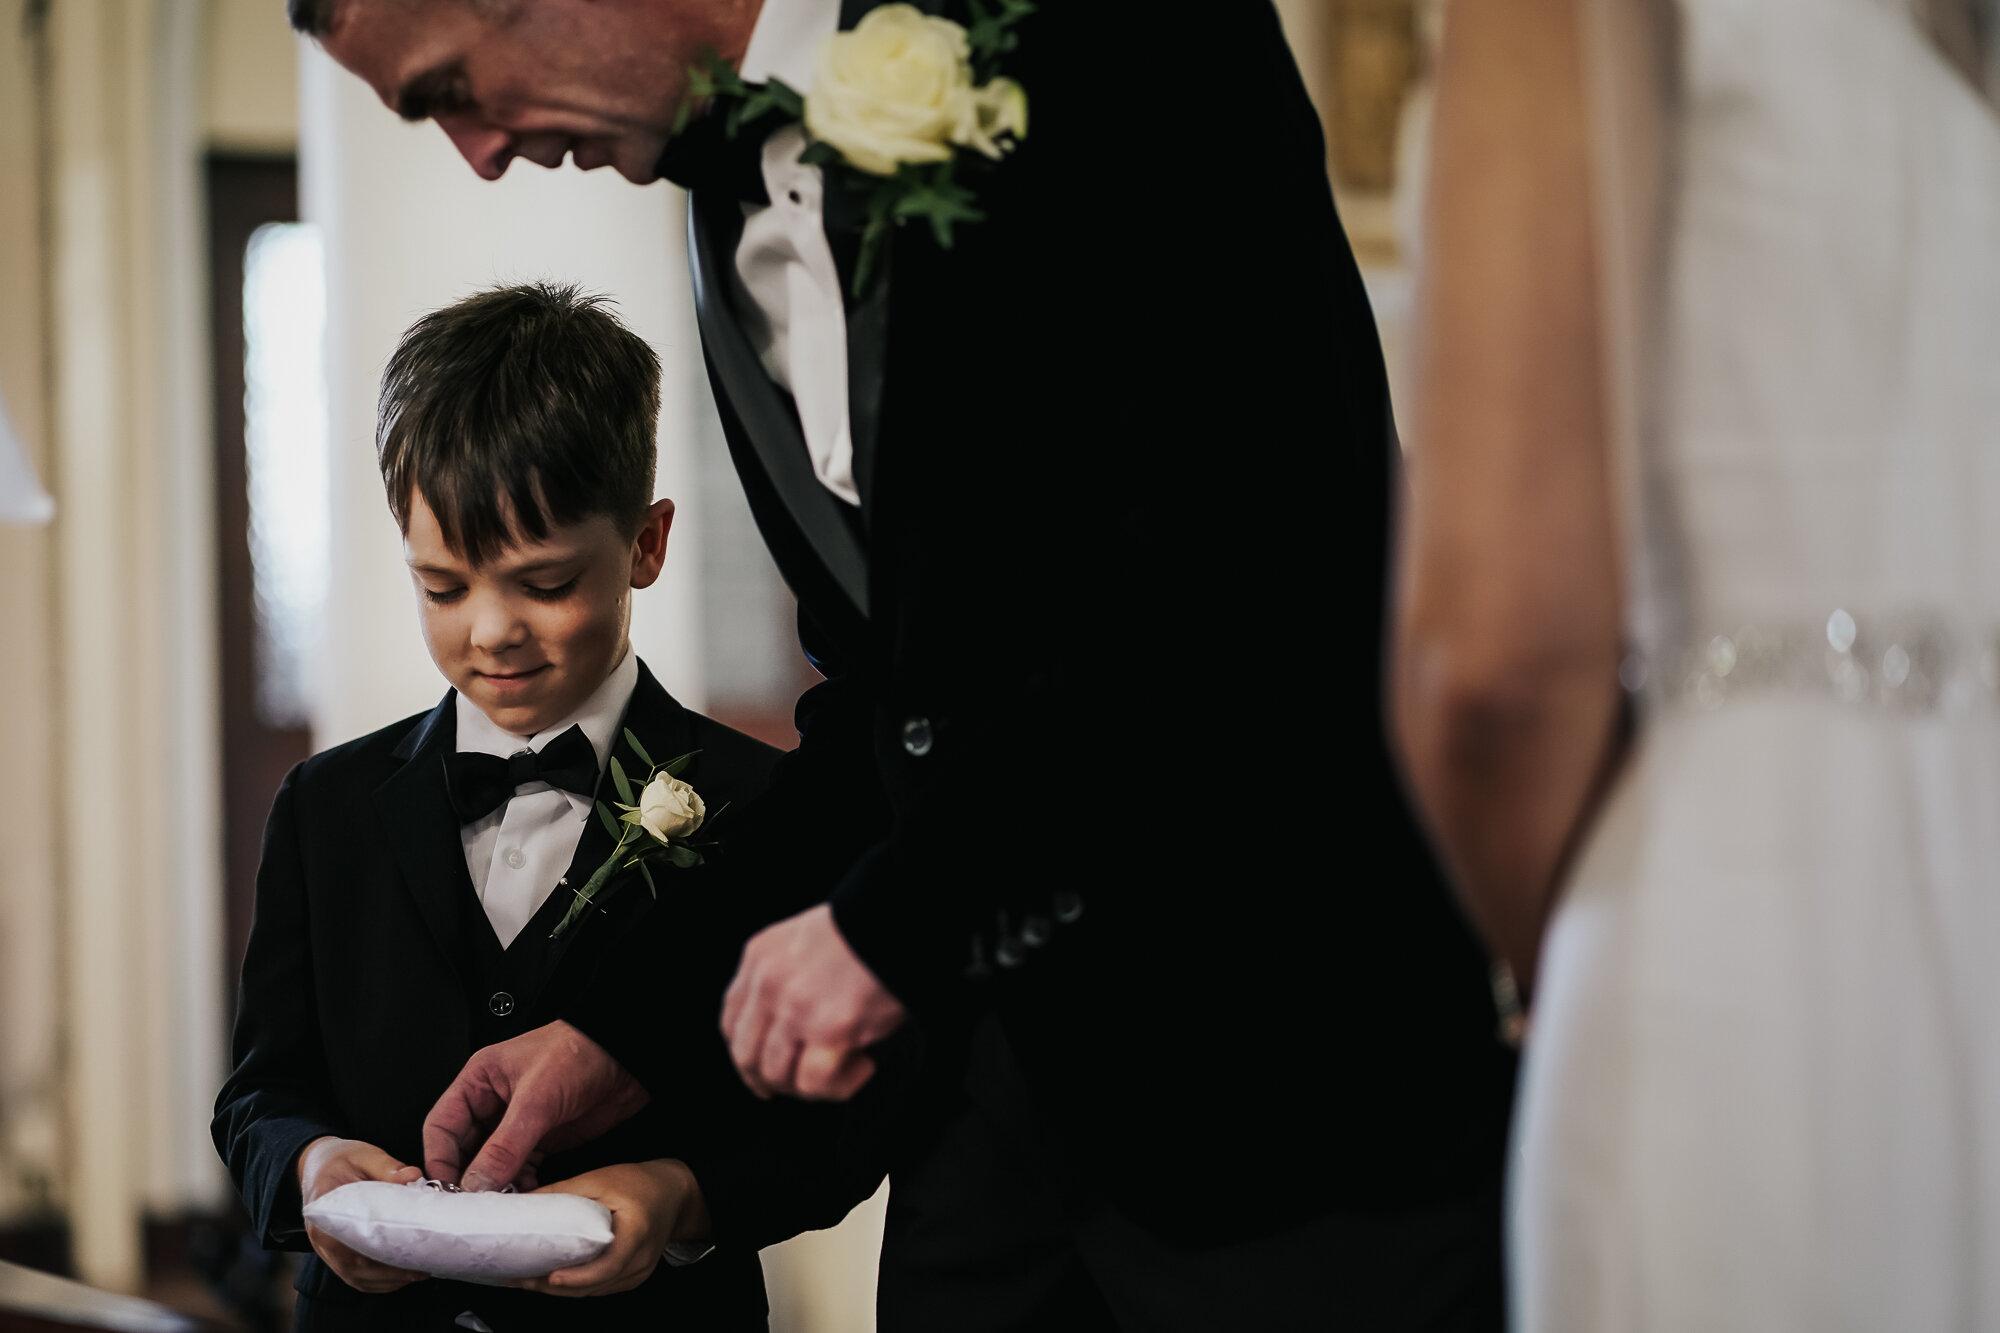 Clontarf Caste wedding photographer Wedding Photography dublin ireland wedding photographer (24 of 58).jpg